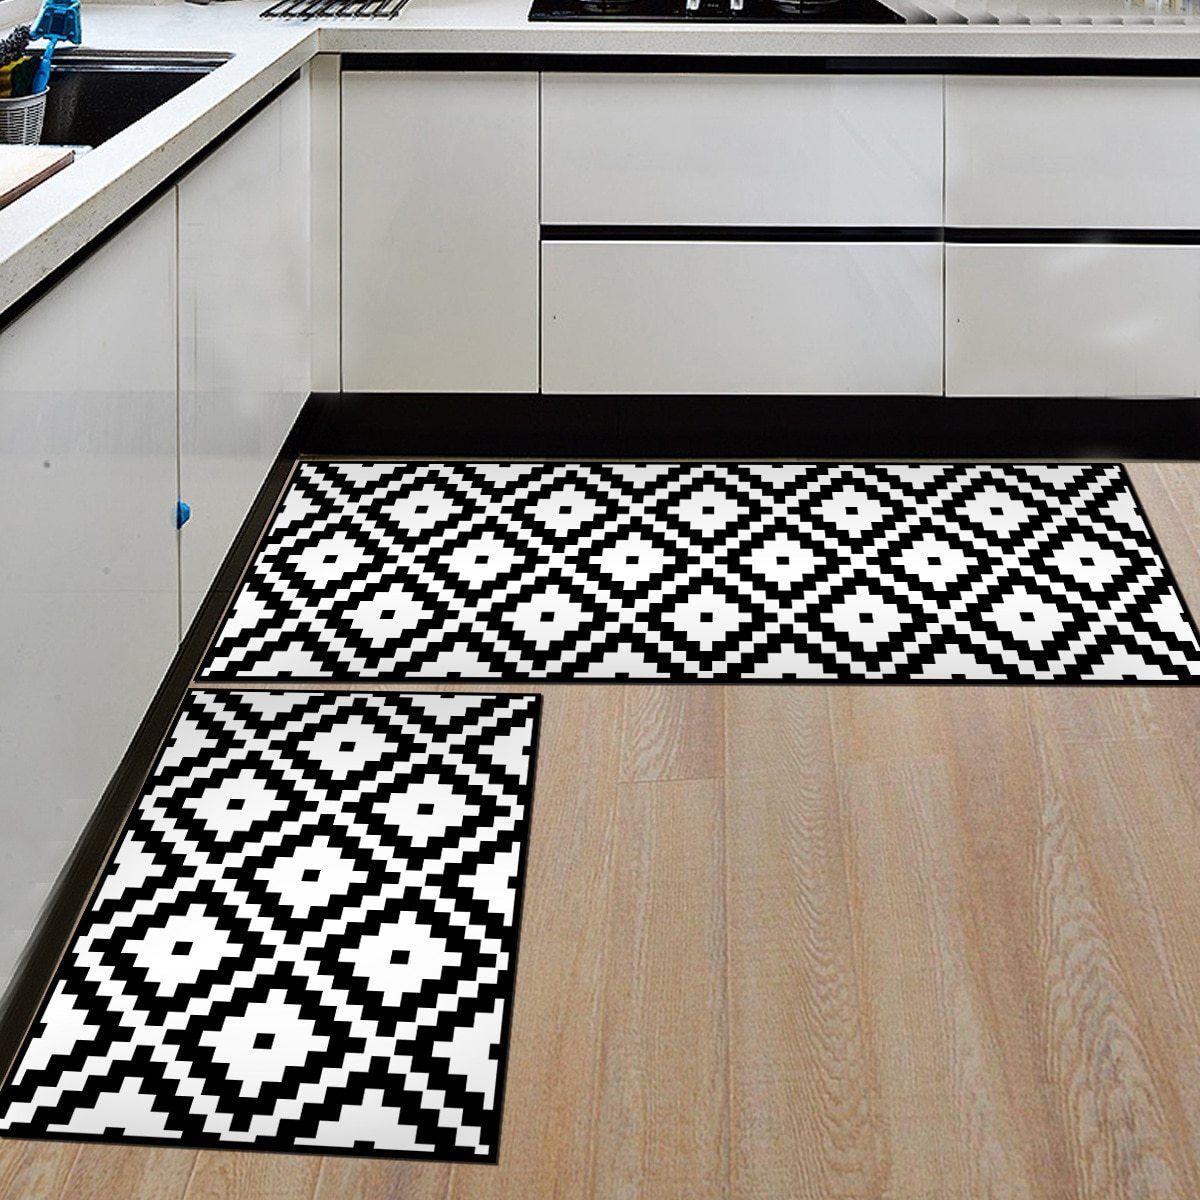 Kitchen Floor Carpet Runner Chef Pattern Mats Area Rugs Entrance Mat 40x120cm